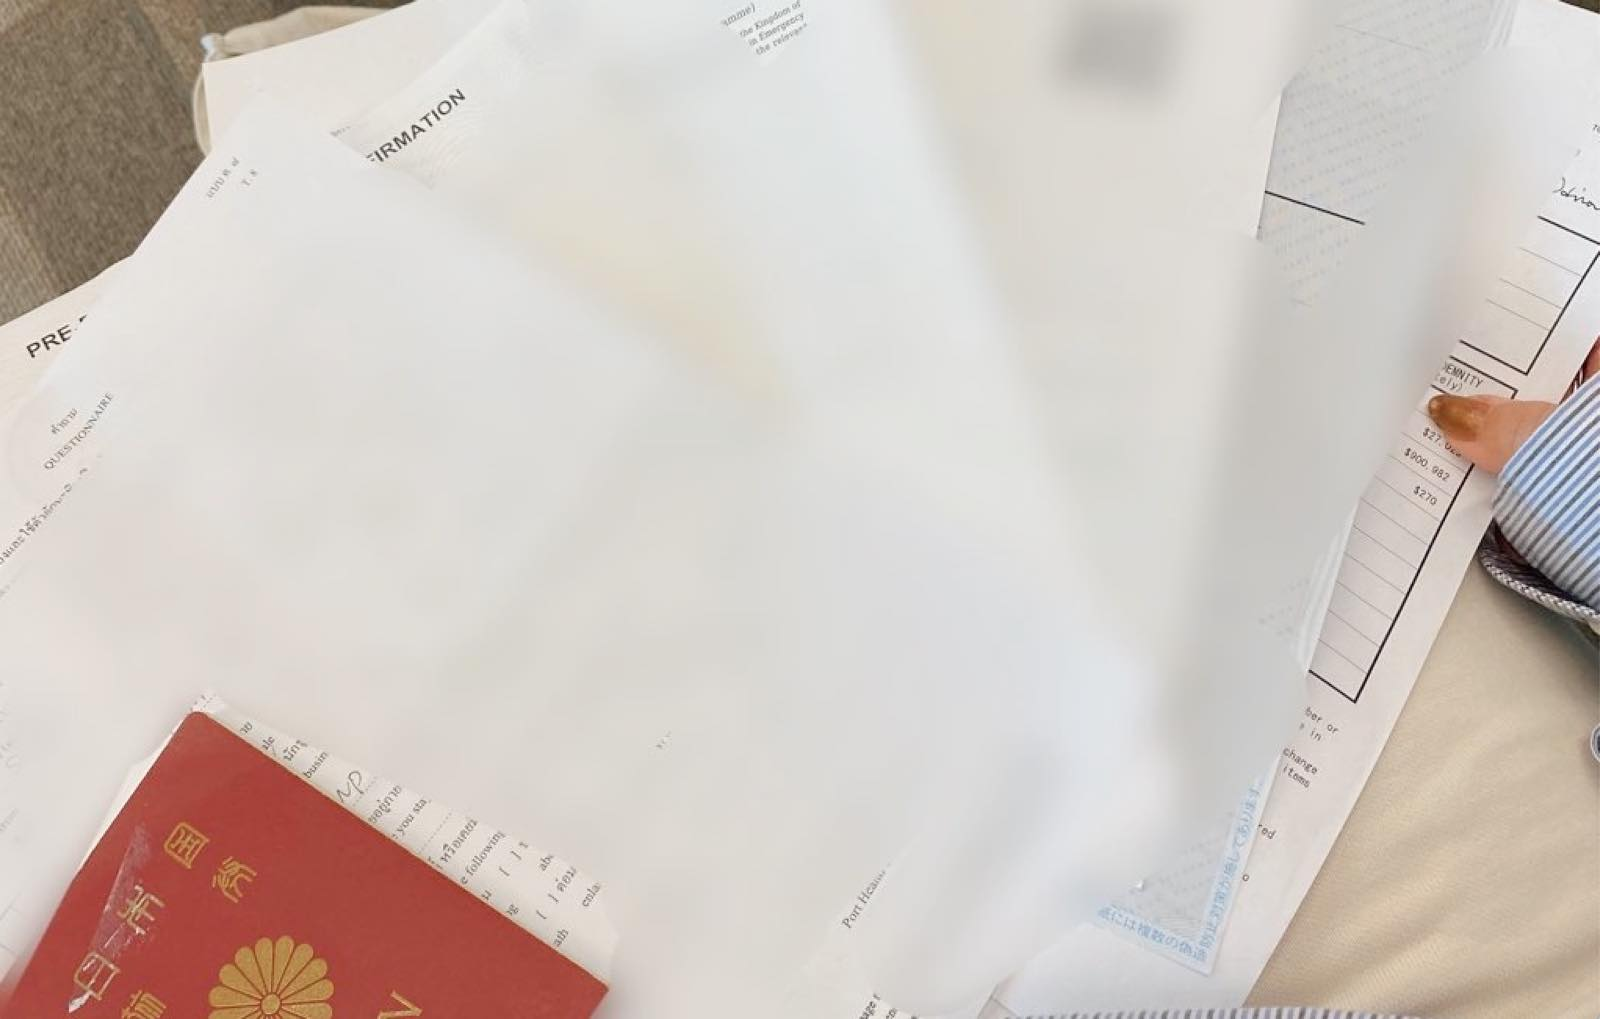 タイ入国時必要書類